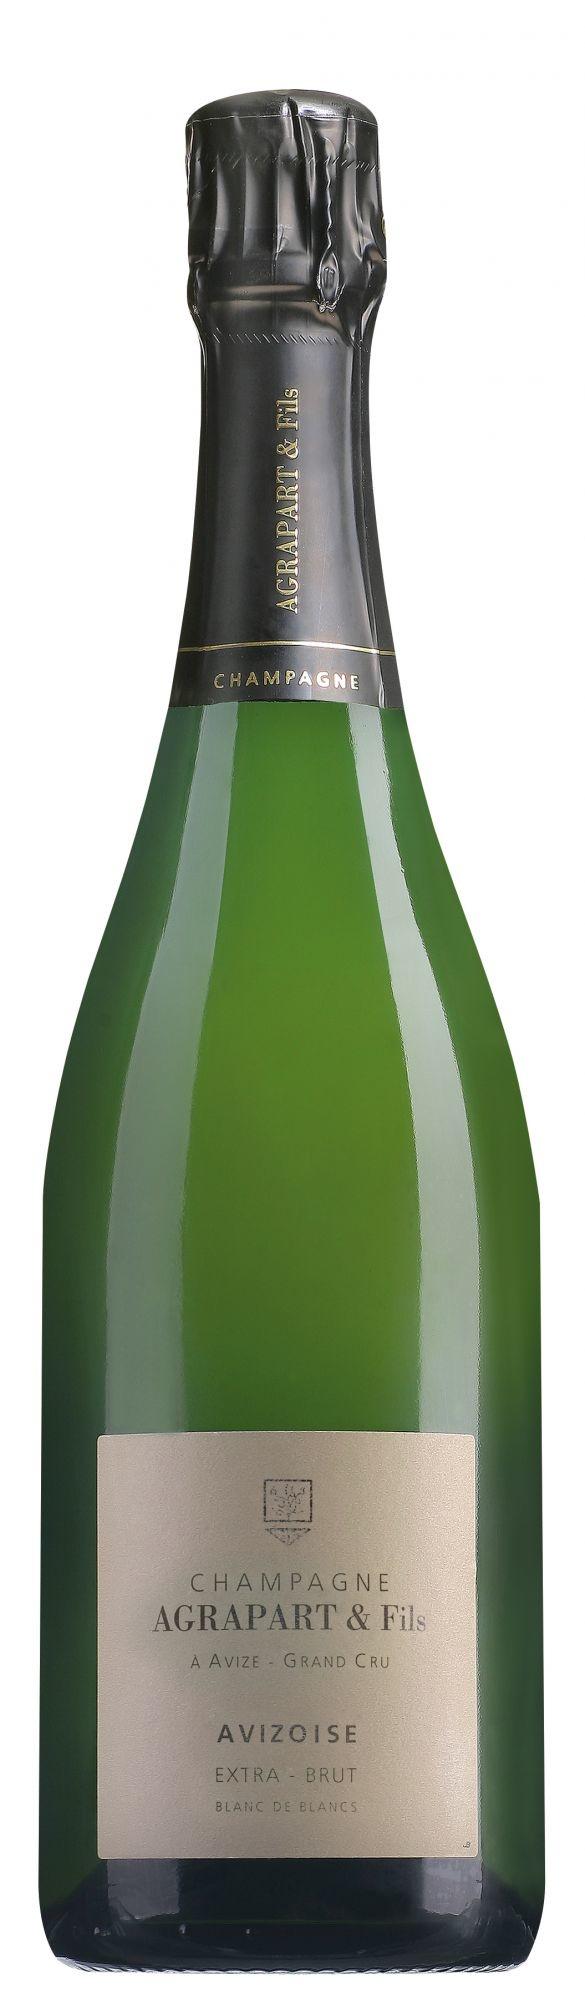 Agrapart Champagner Grand Cru Avizoise Extra Brut 2013